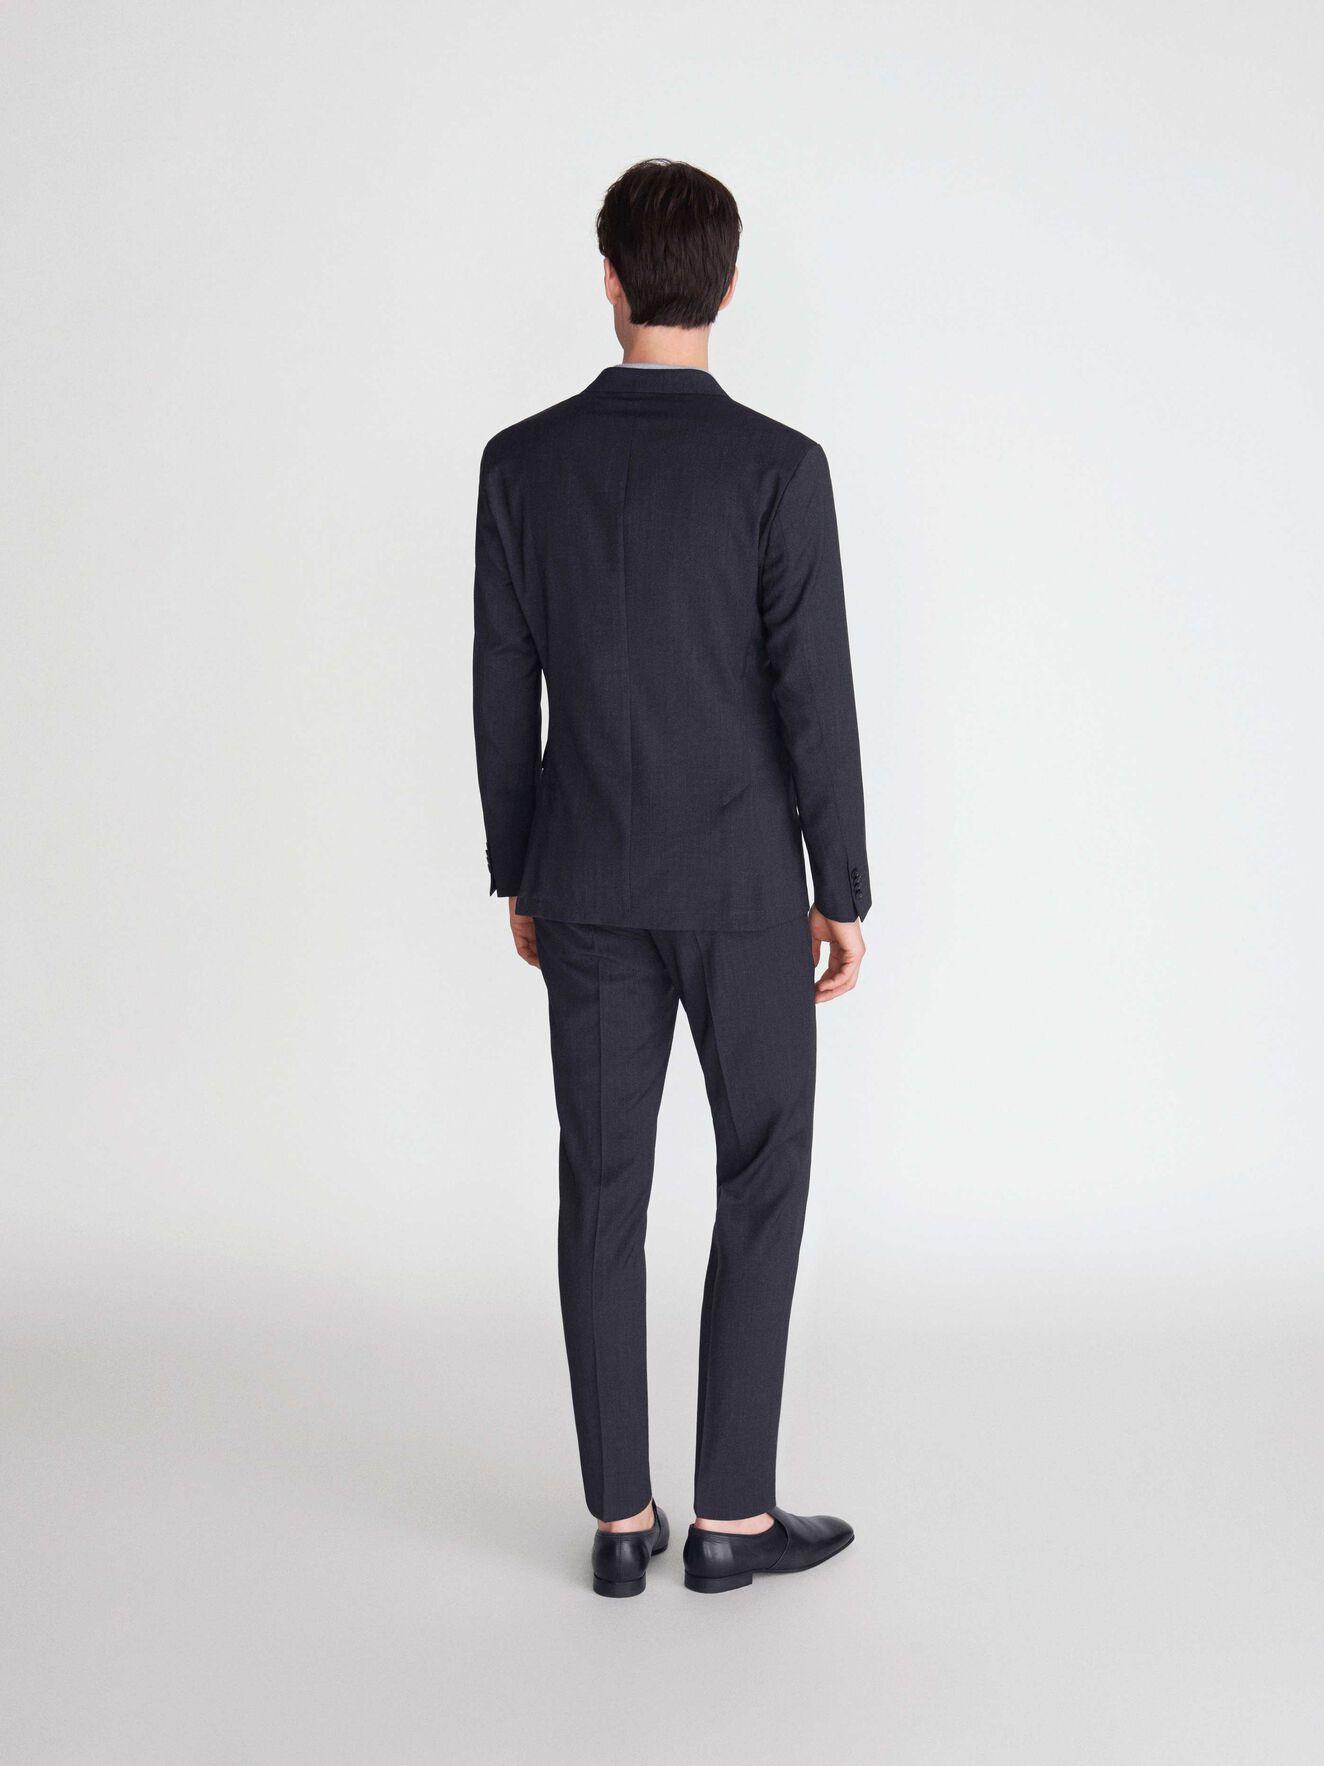 Tordon Trousers in Dark grey Mel from Tiger of Sweden